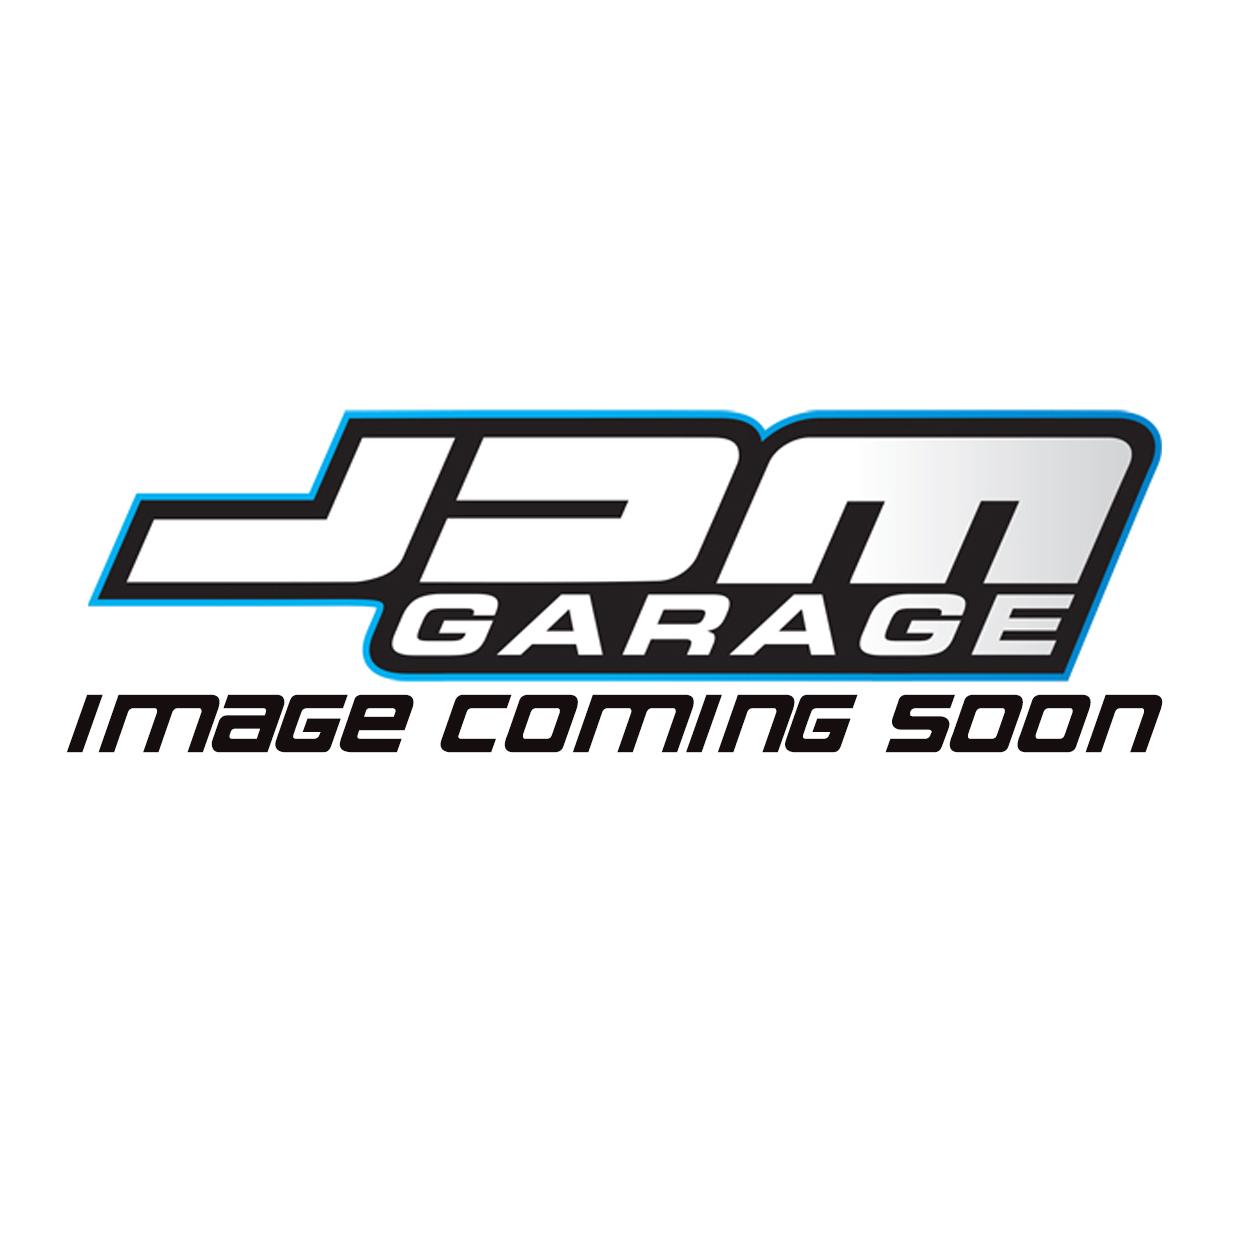 OE Replacement & EBC GD Series Rear Brake Discs - Nissan Juke